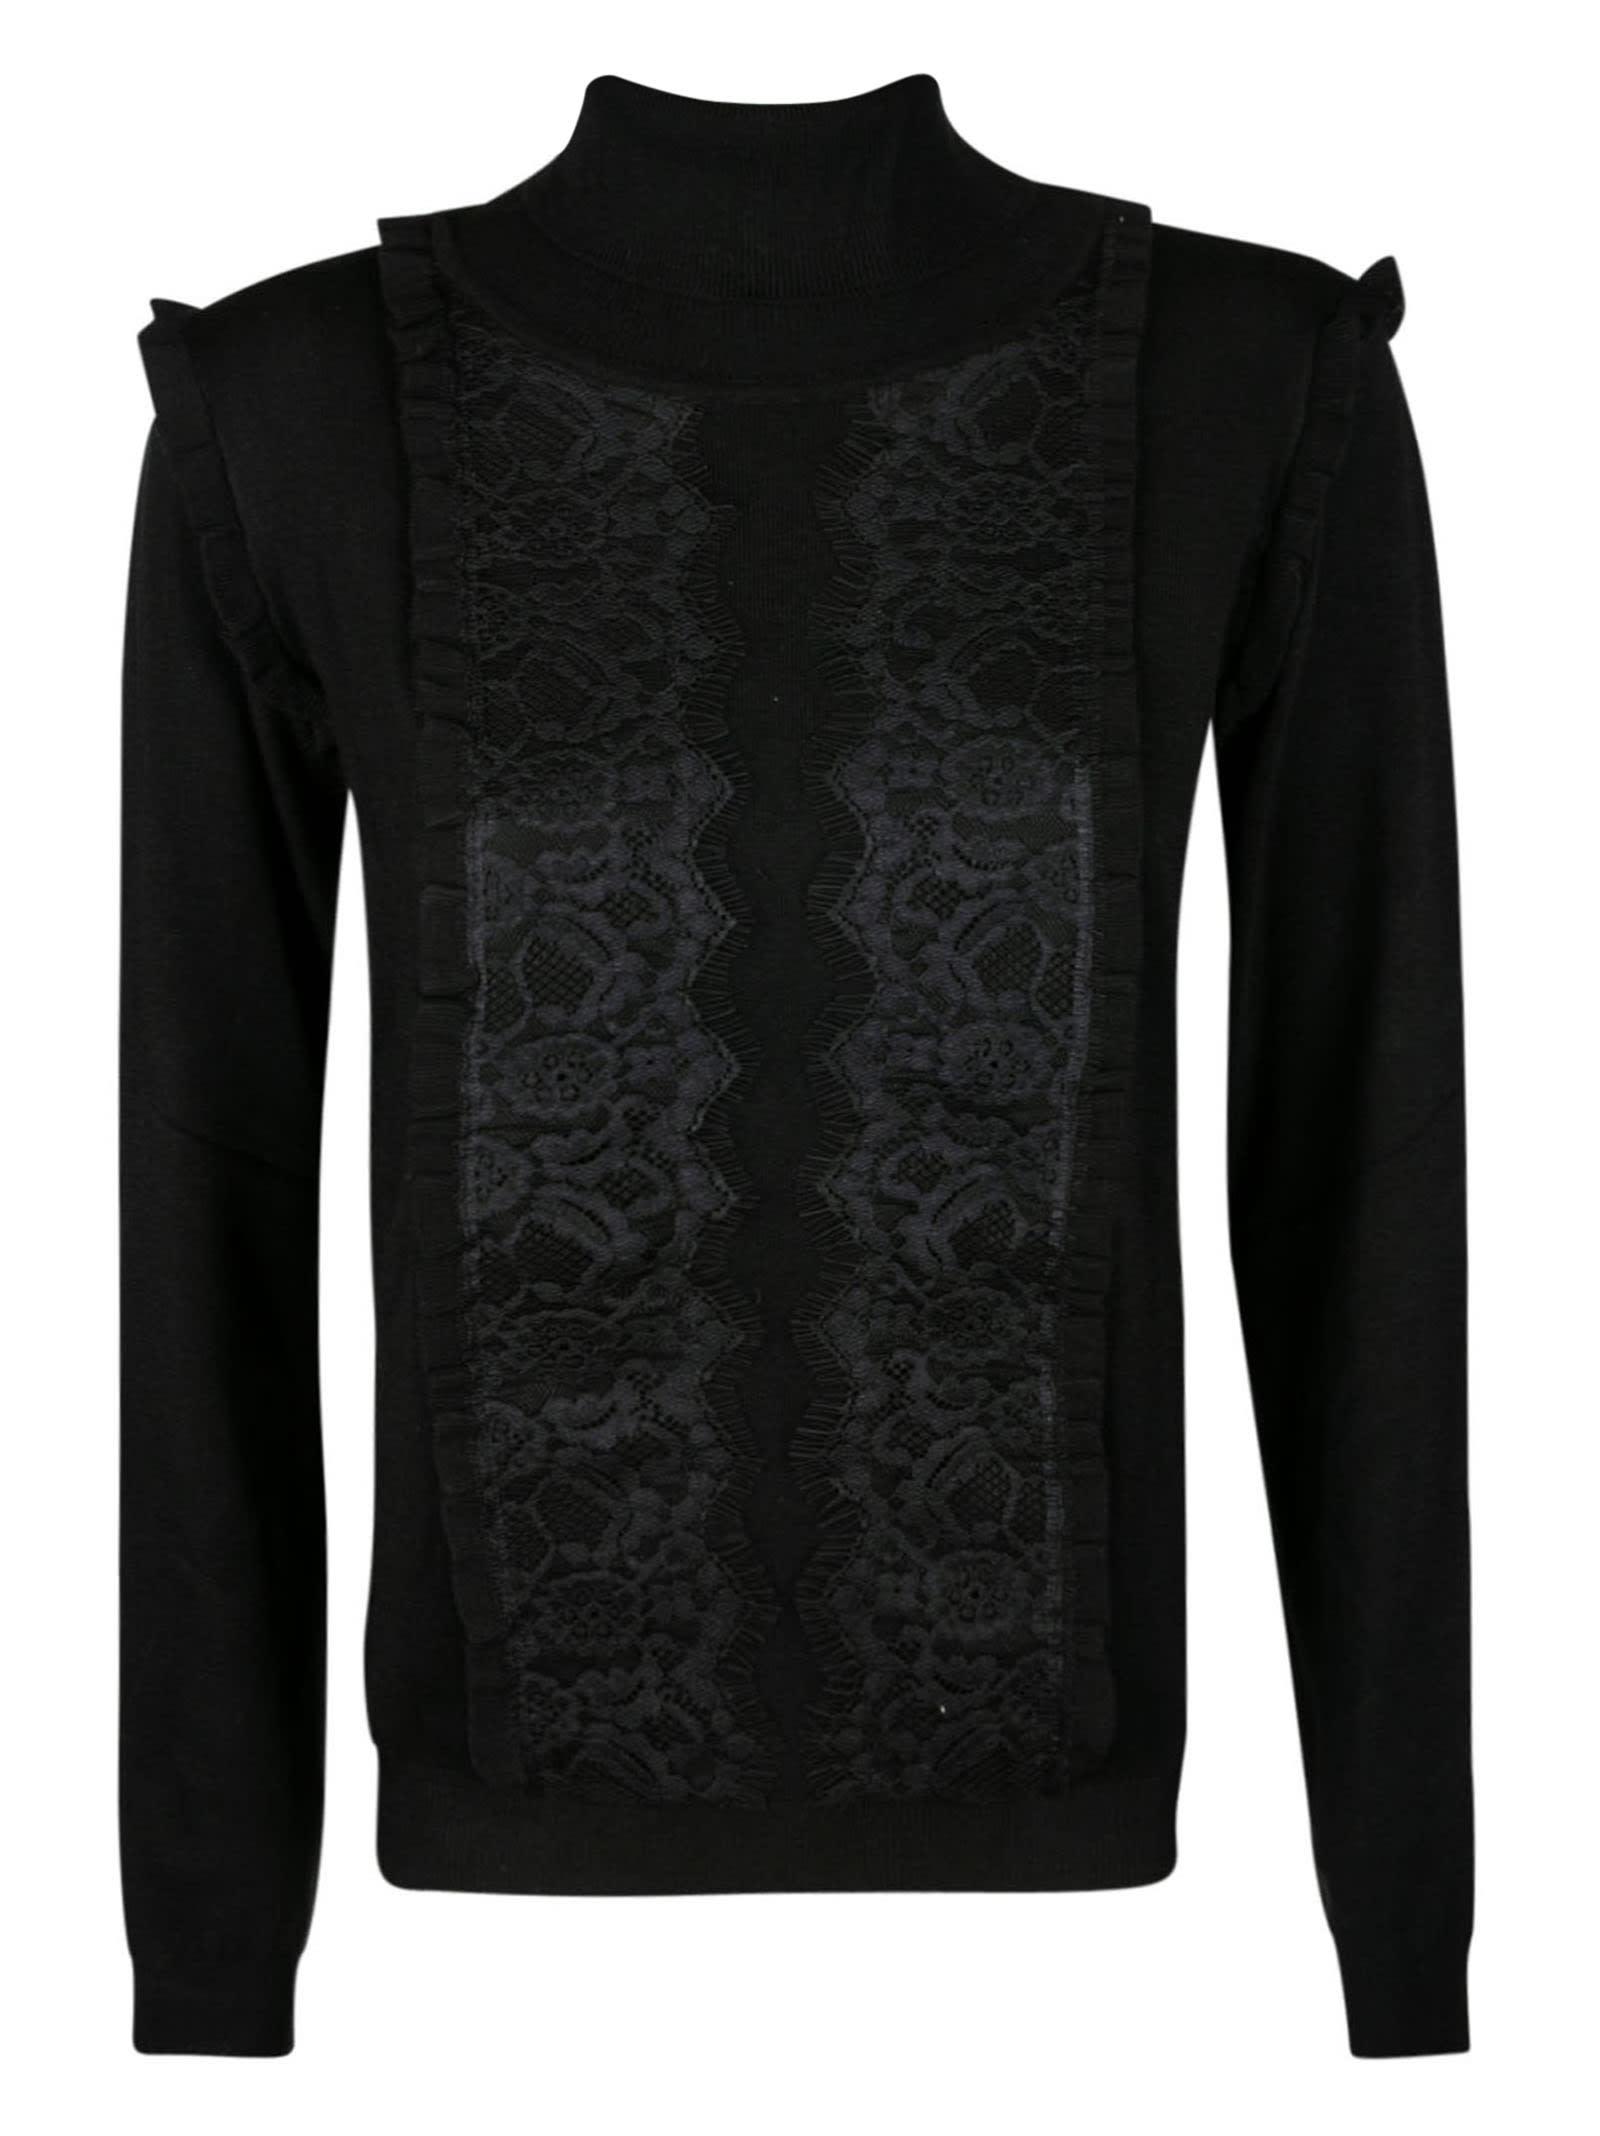 Ruffle Trimmed Turtleneck Sweater